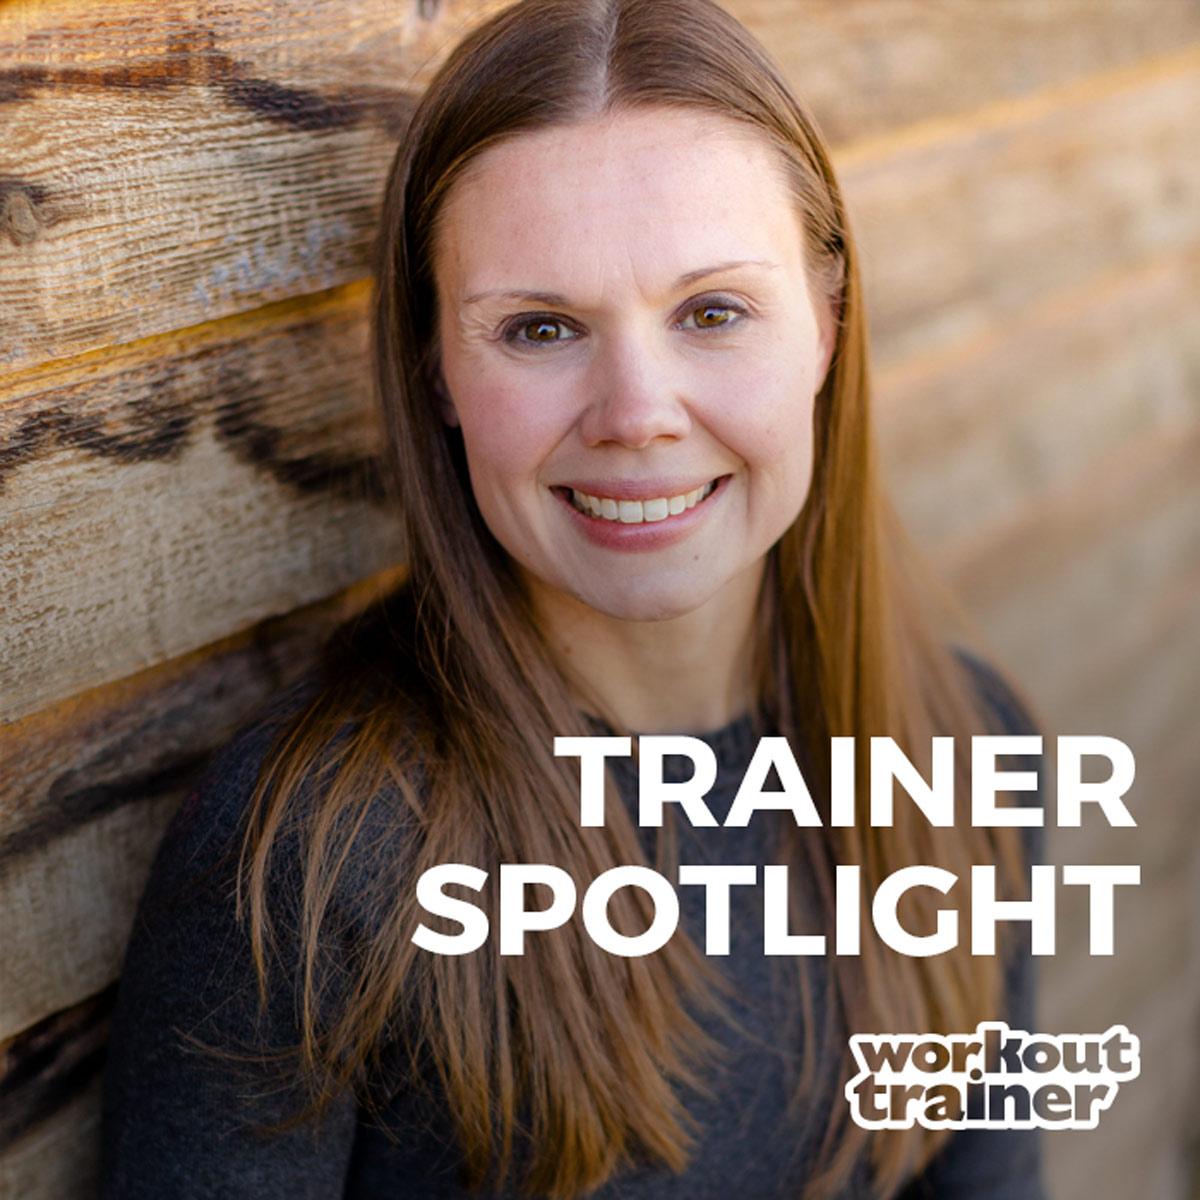 Workout Trainer by Skimble: Trainer Spotlight: Lisa McNett